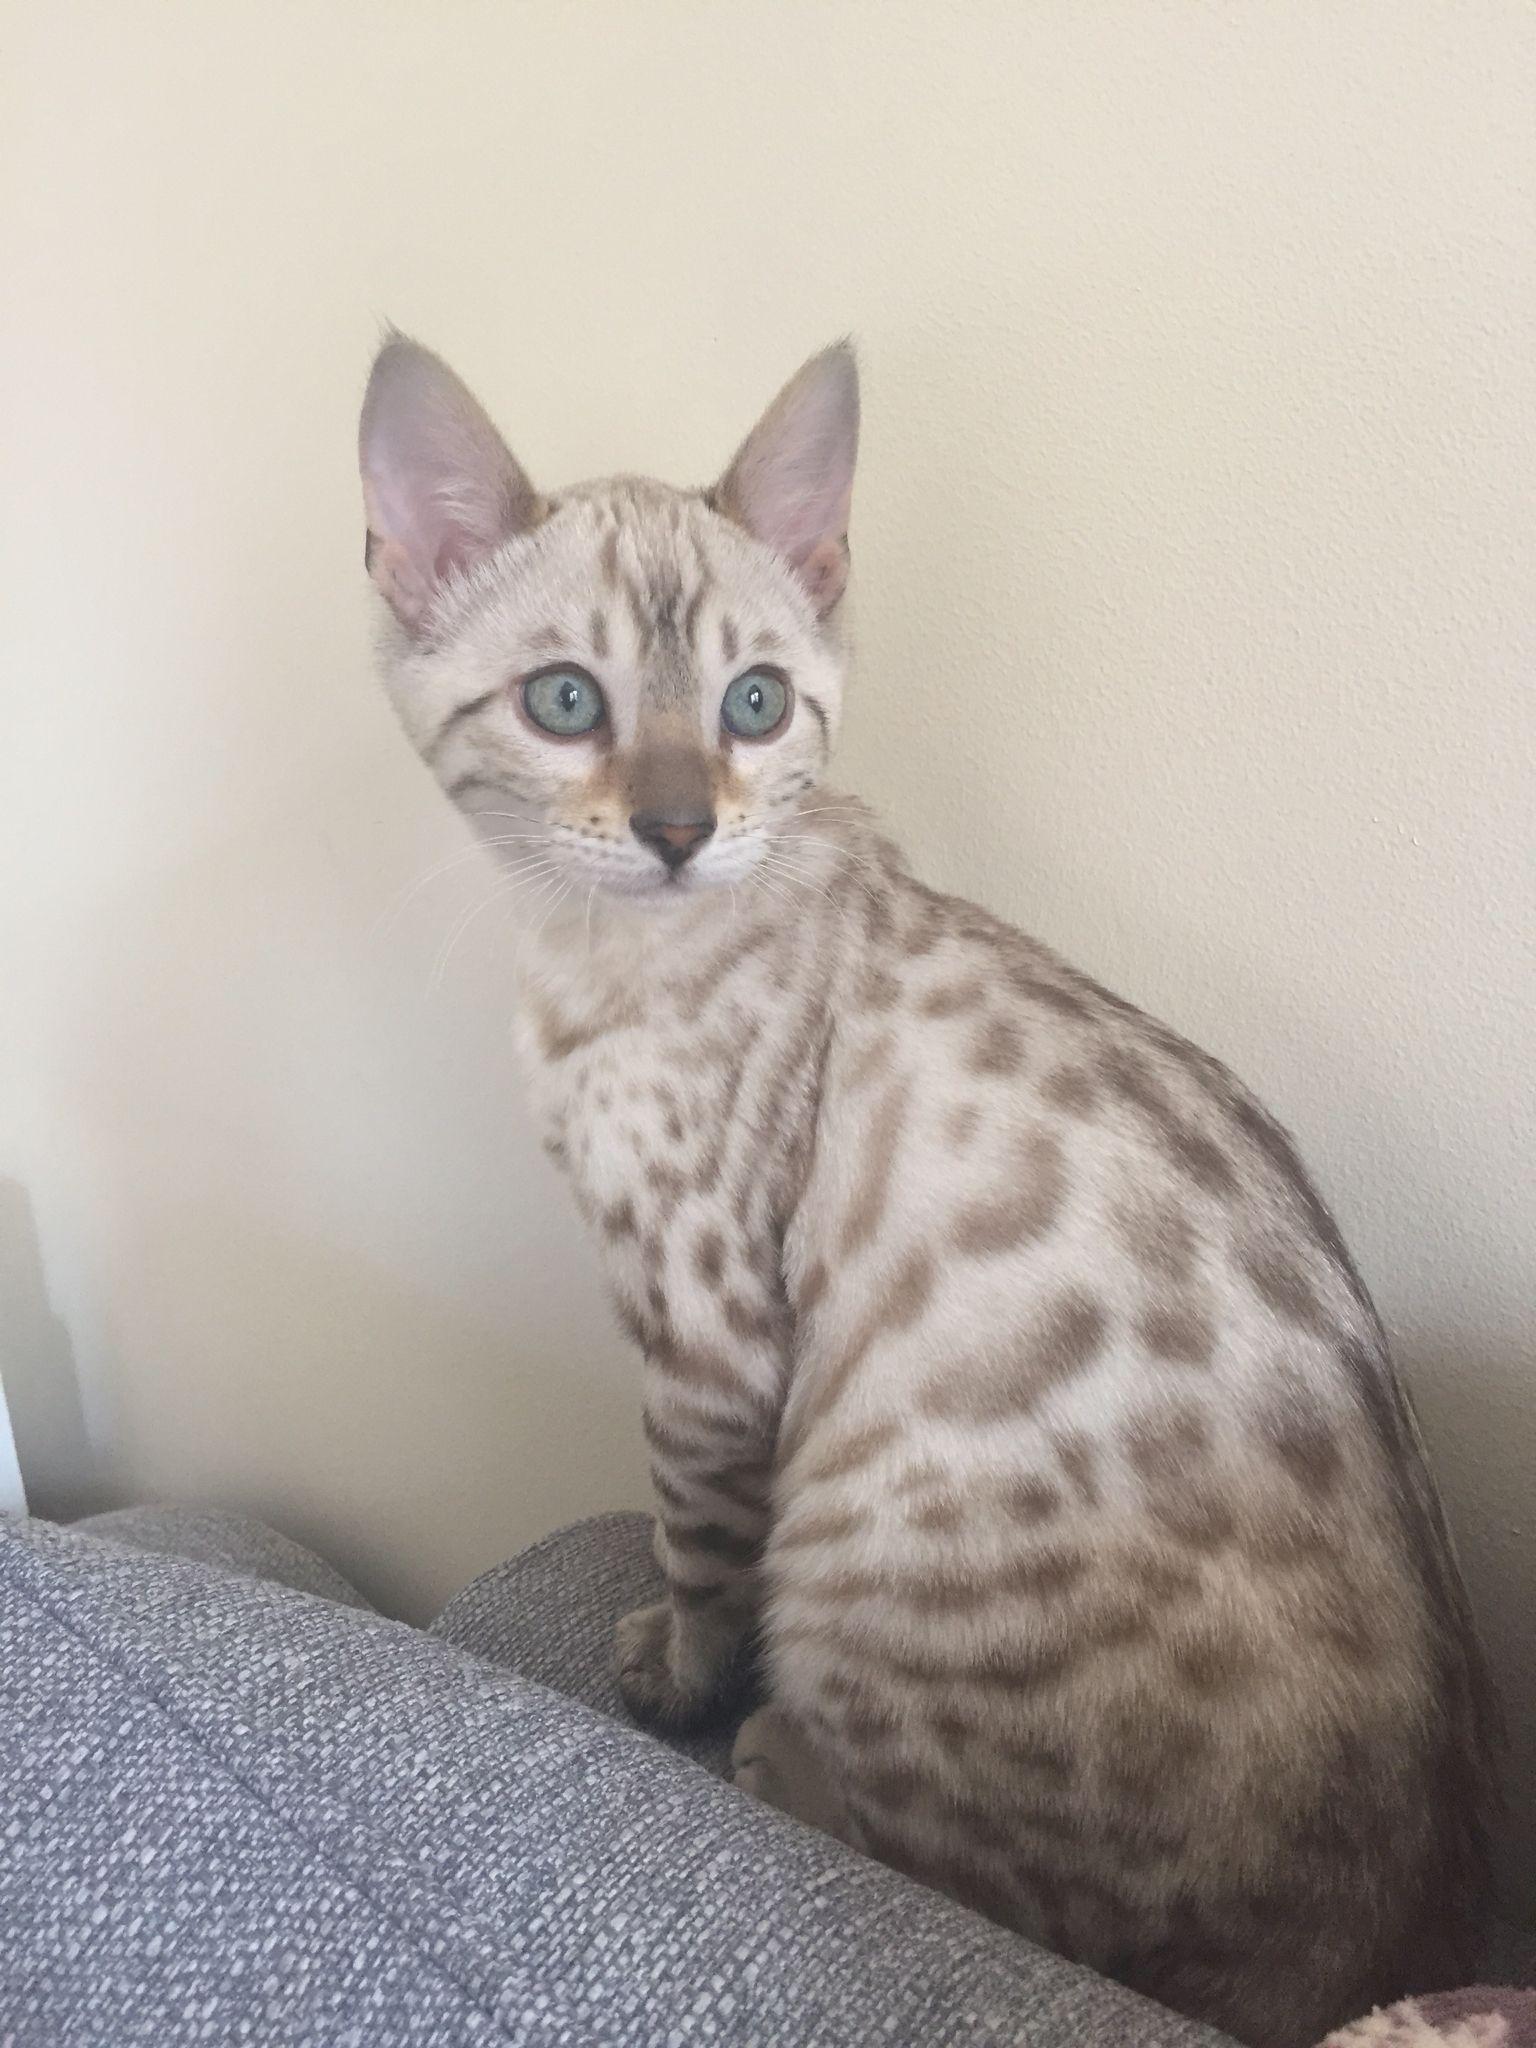 My Blue Eyed Snow Bengal Kitten Bengalkittens My Blue Eyed Snow Bengal Kitten In 2020 Bengal Kitten Bengal Cat Kitten Bengal Cat